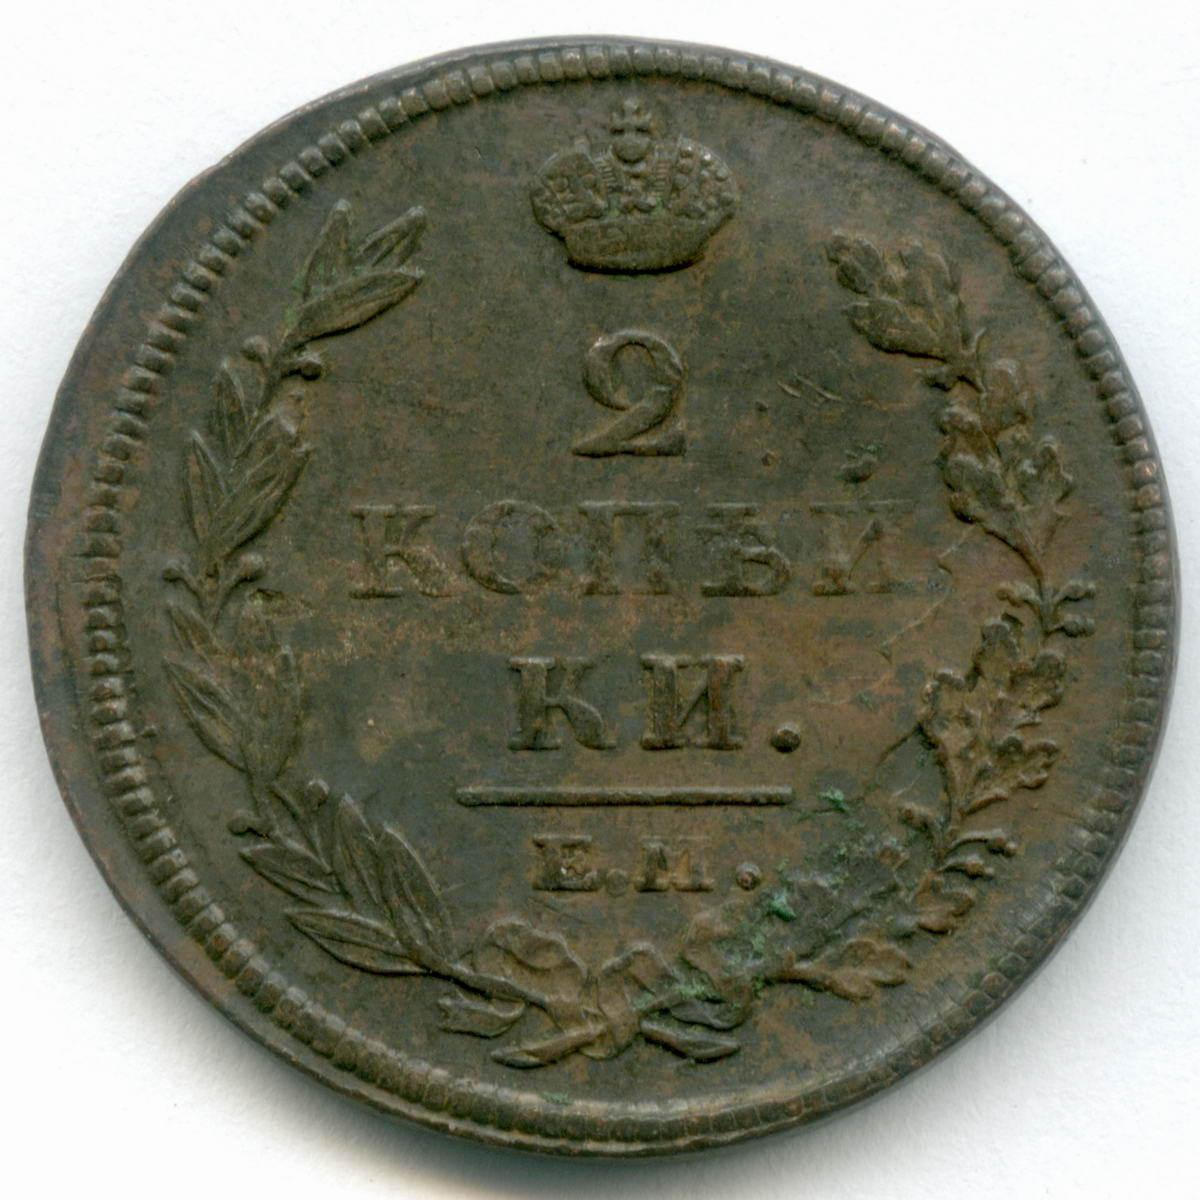 2 копейки 1812 год. ЕМ-НМ. XF+